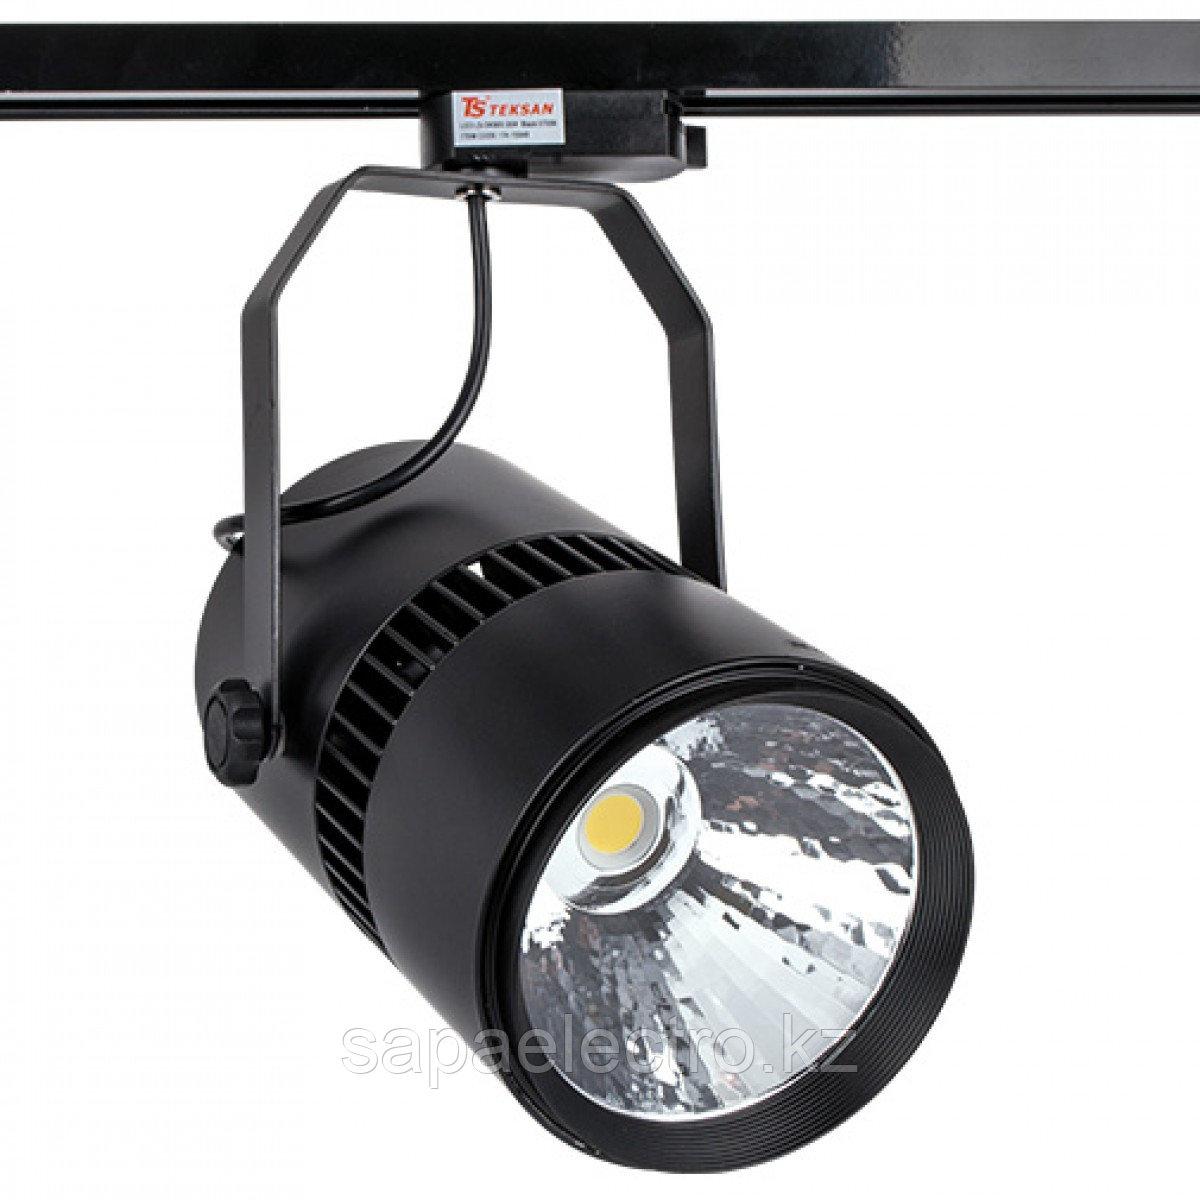 Св-к. LED LS-DK905 35W 3000K BLACK (TS)12шт,20шт